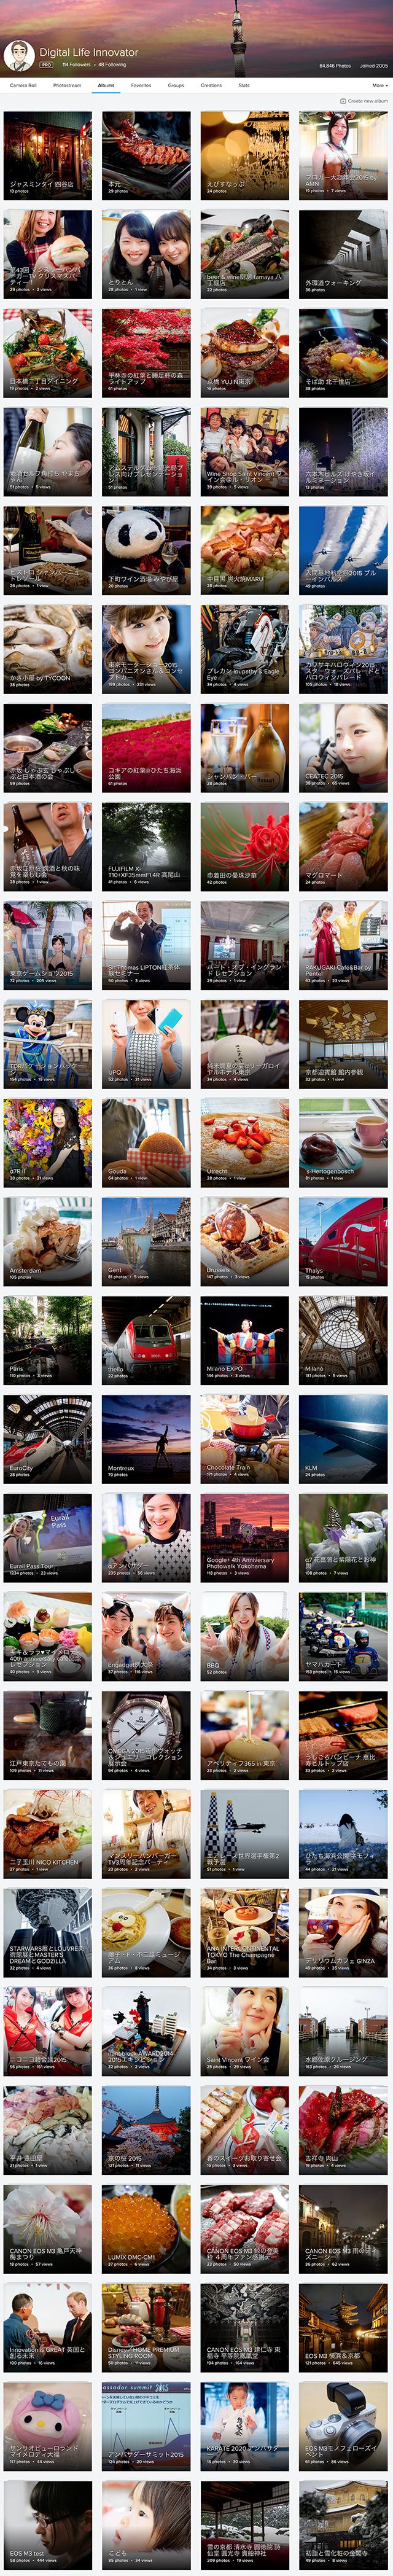 screencapture-www-flickr-com-photos-23743160-N00-albums-1451449241500-small